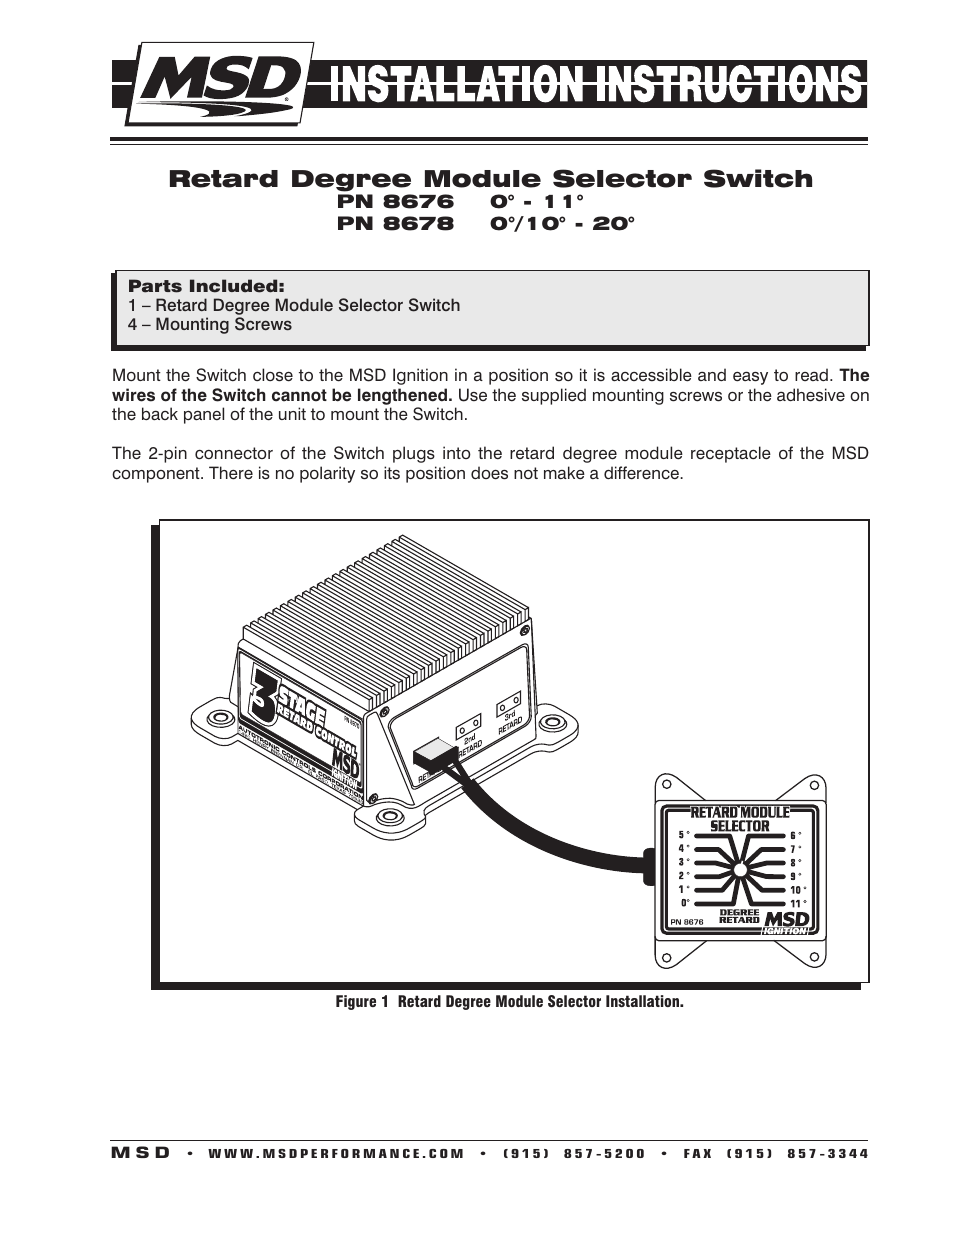 Msd 8676 Wiring Diagram Expert Diagrams 6al Retard Box Free Download 8678 Selector Switch 0 10 20 Installation User Manual 5